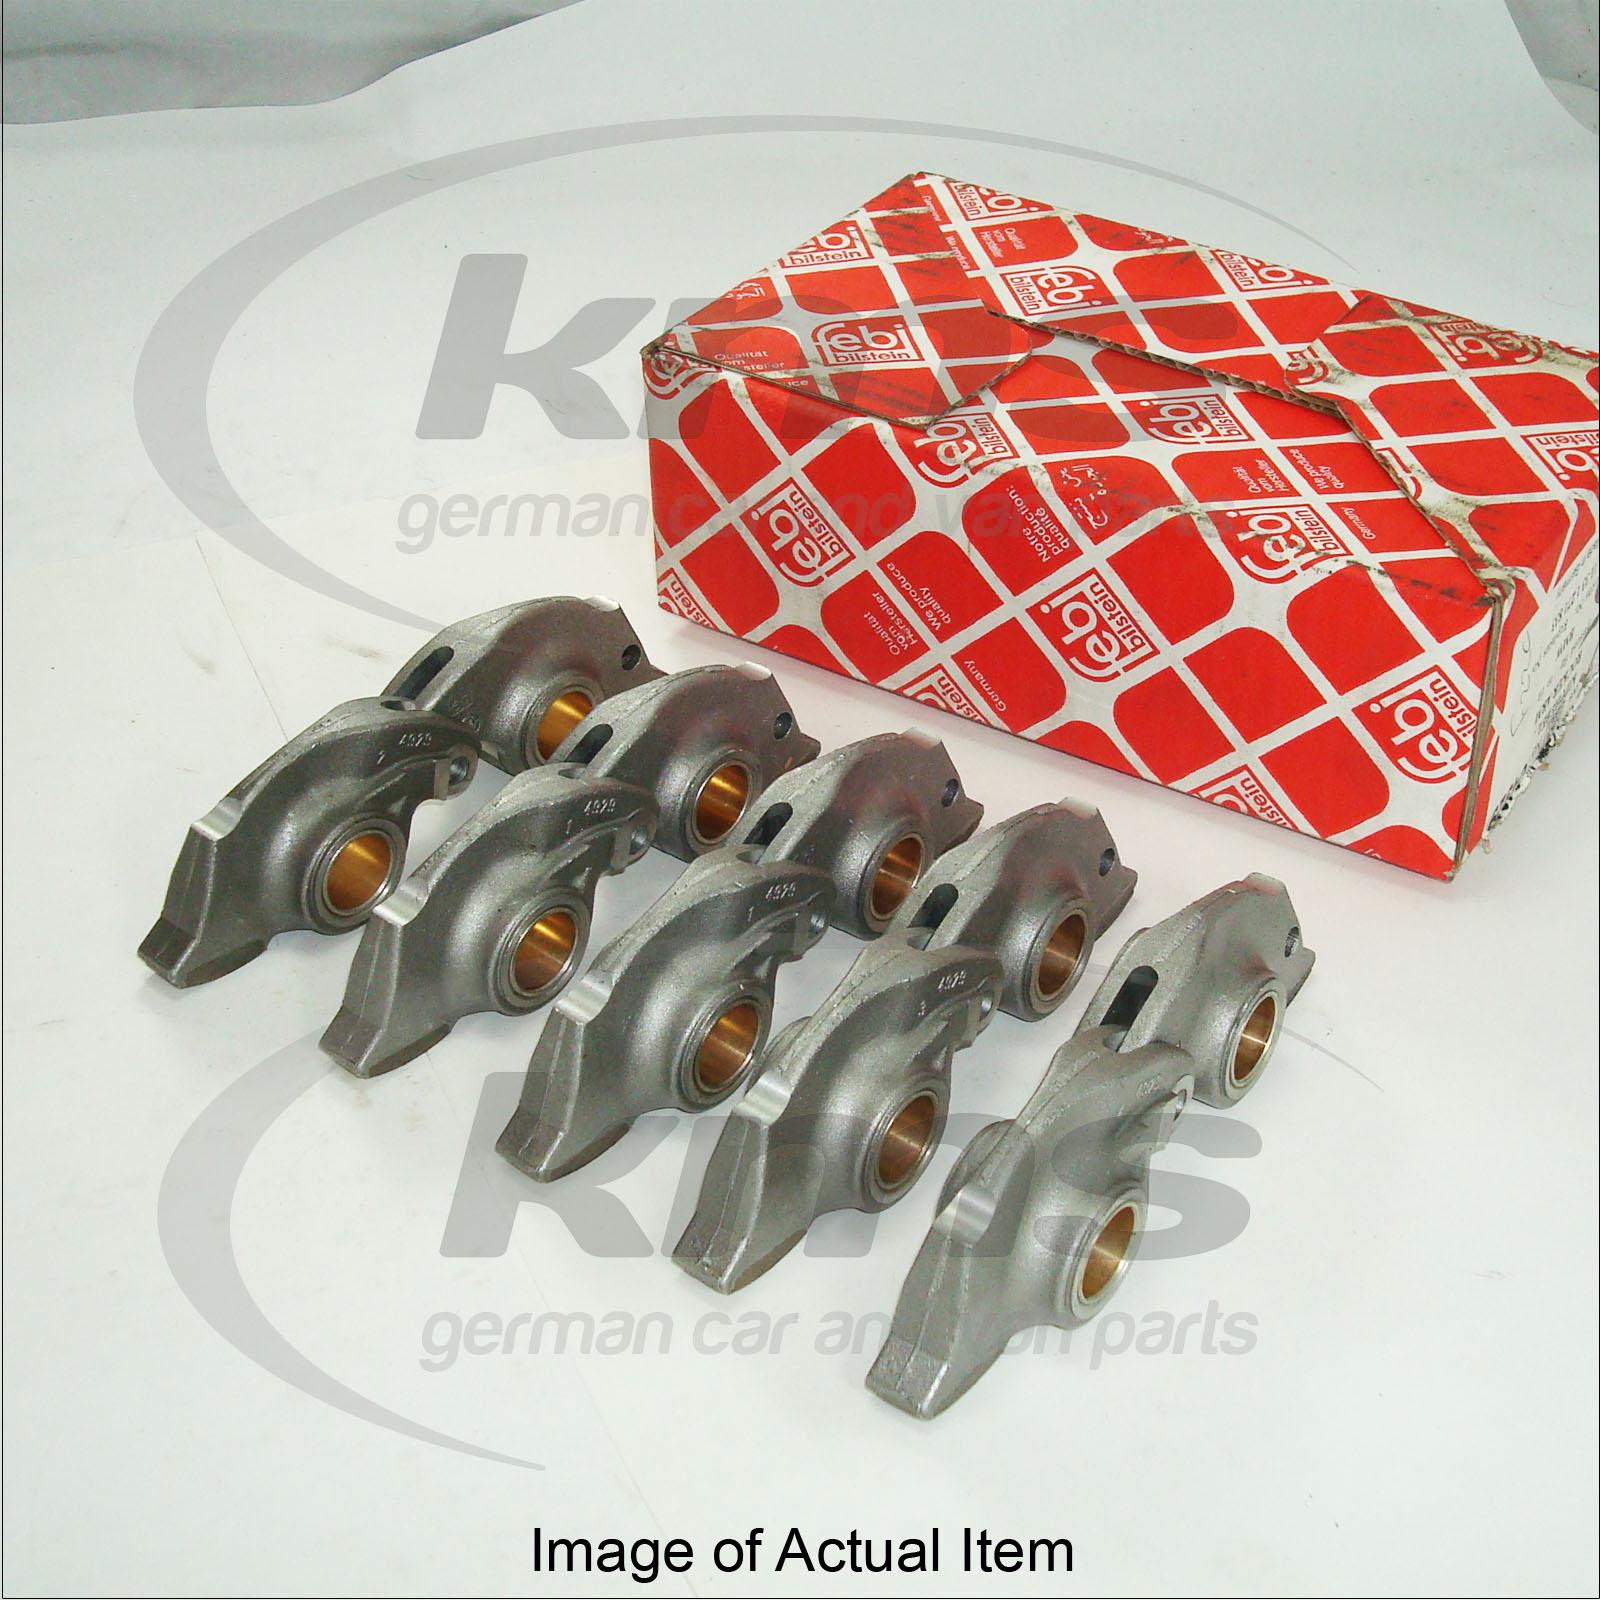 CAM FOLLOWER 3/5/7 Series 1.6,1.6i,1.8i,2.5i-3.5i M10,M30 75-94 HYD BMW 5 SERIES